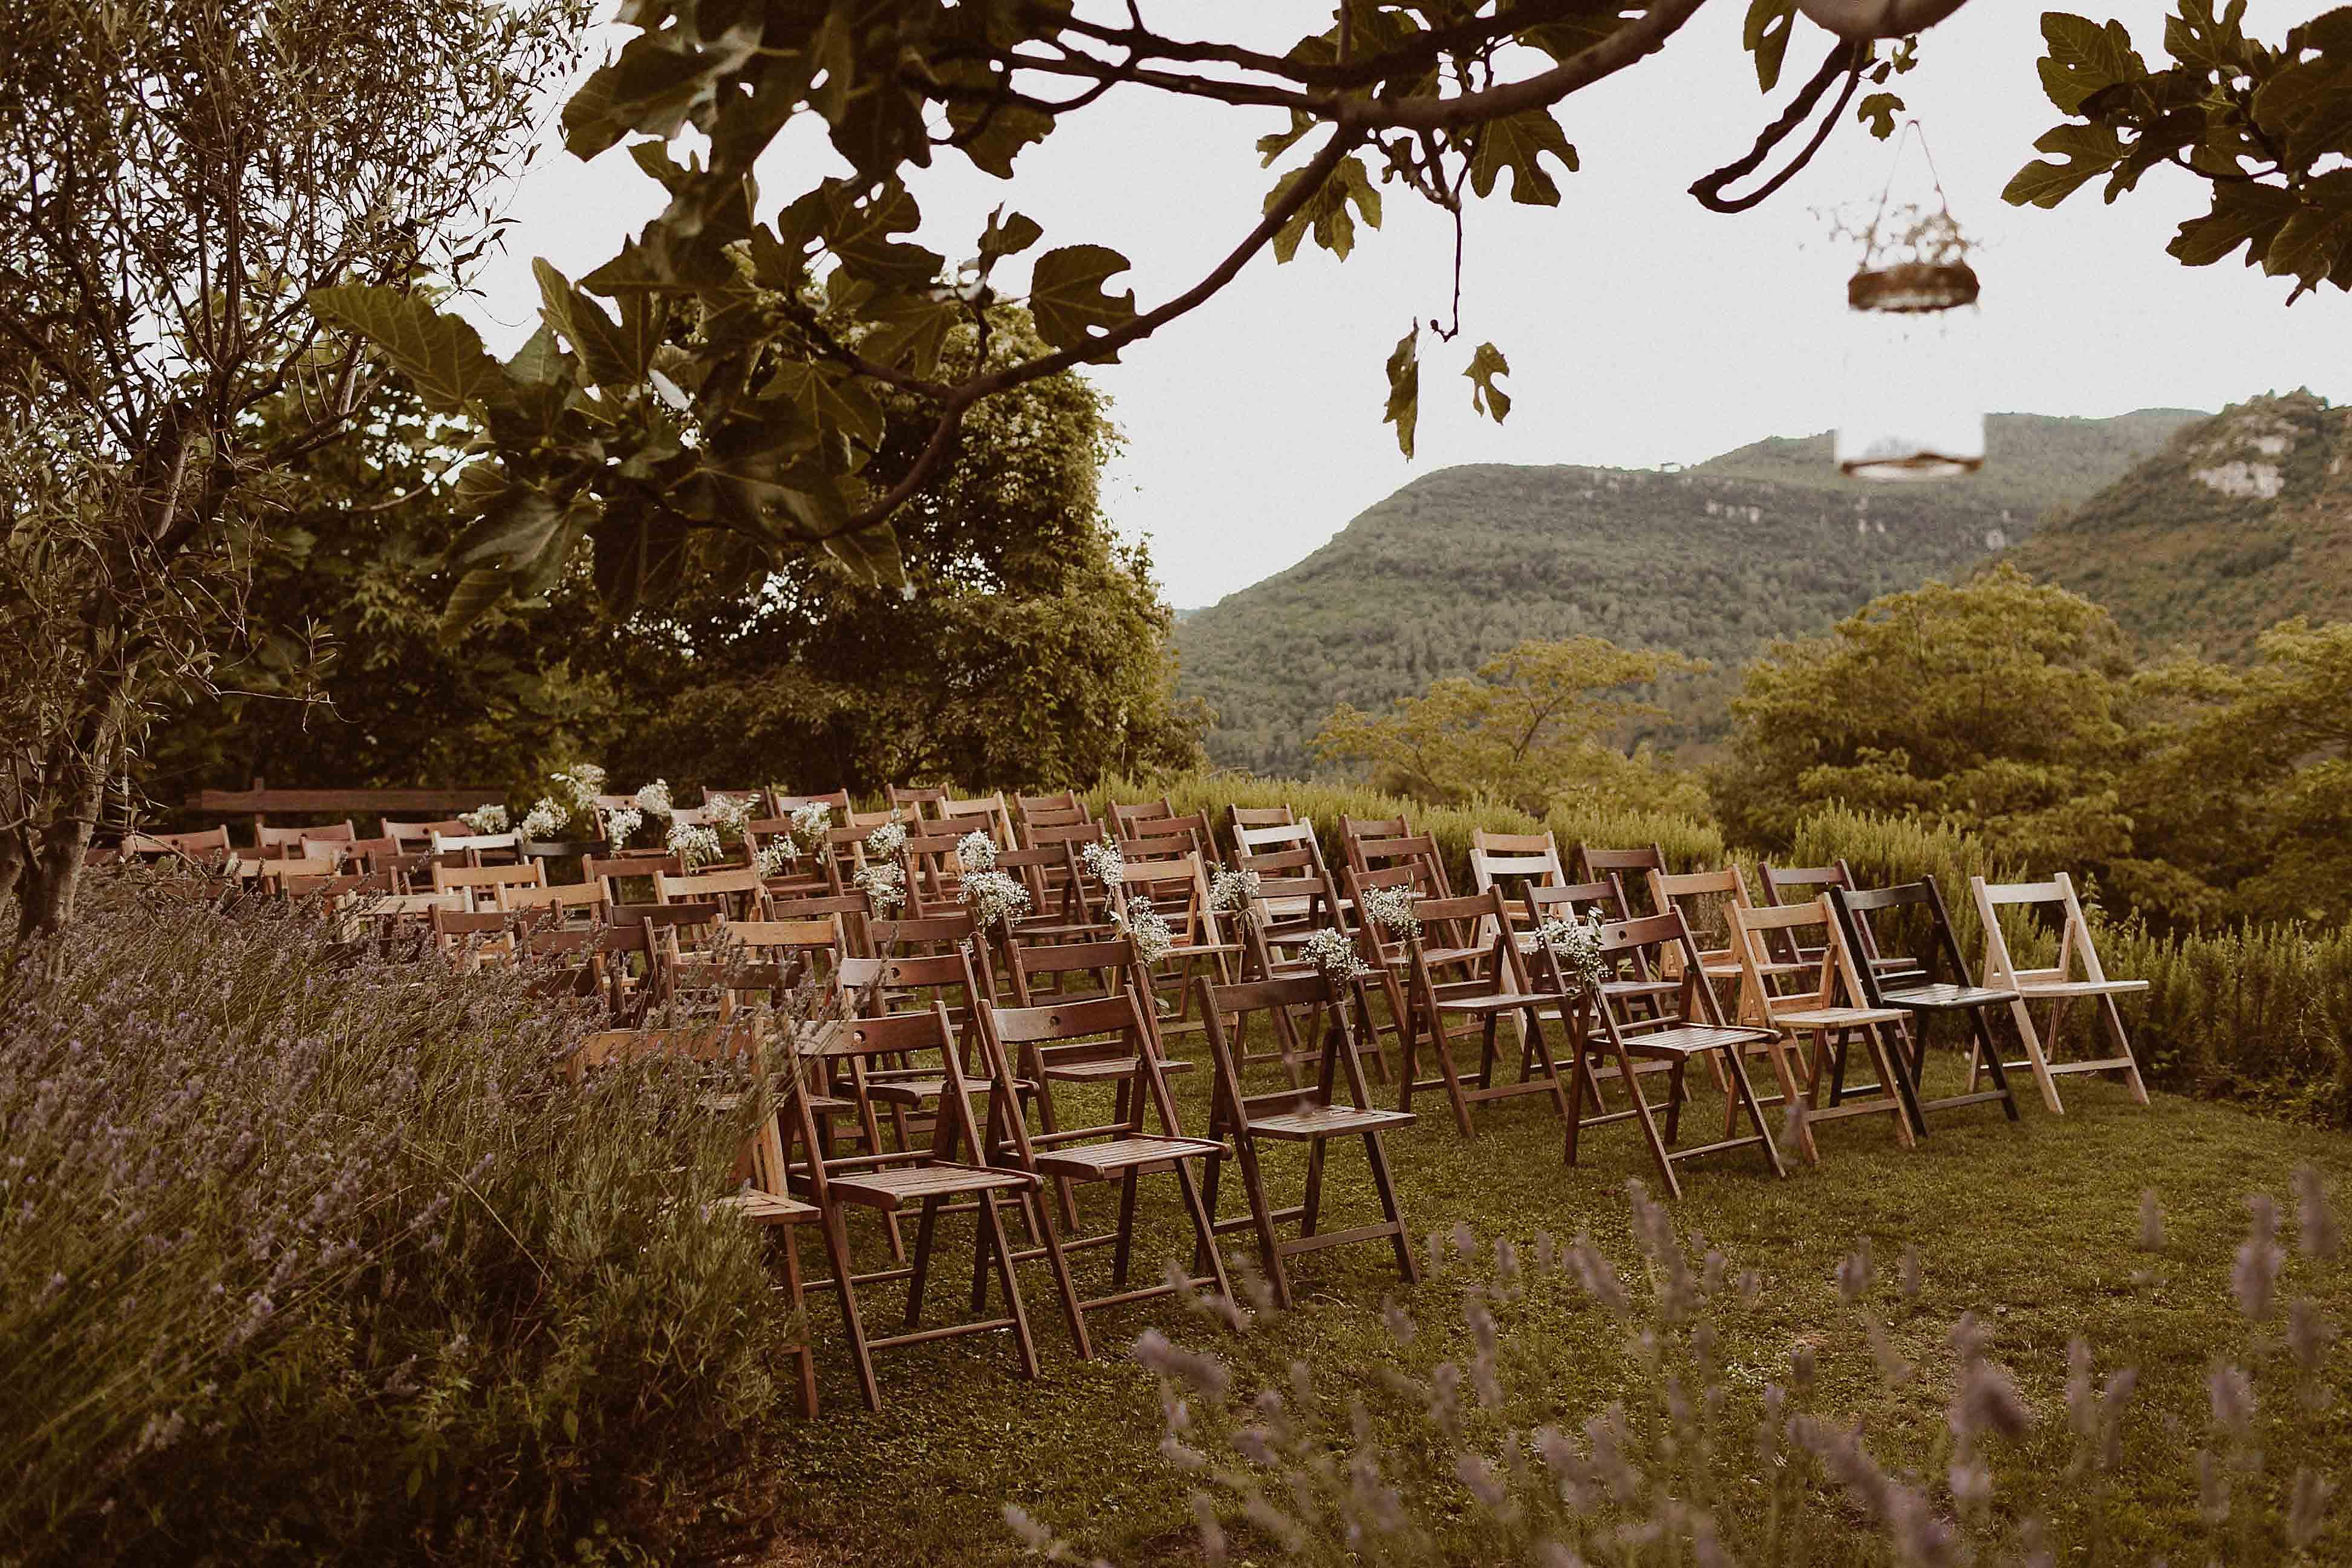 Boda rústica en la montaña. fotgrafo de bodas barcelona_010